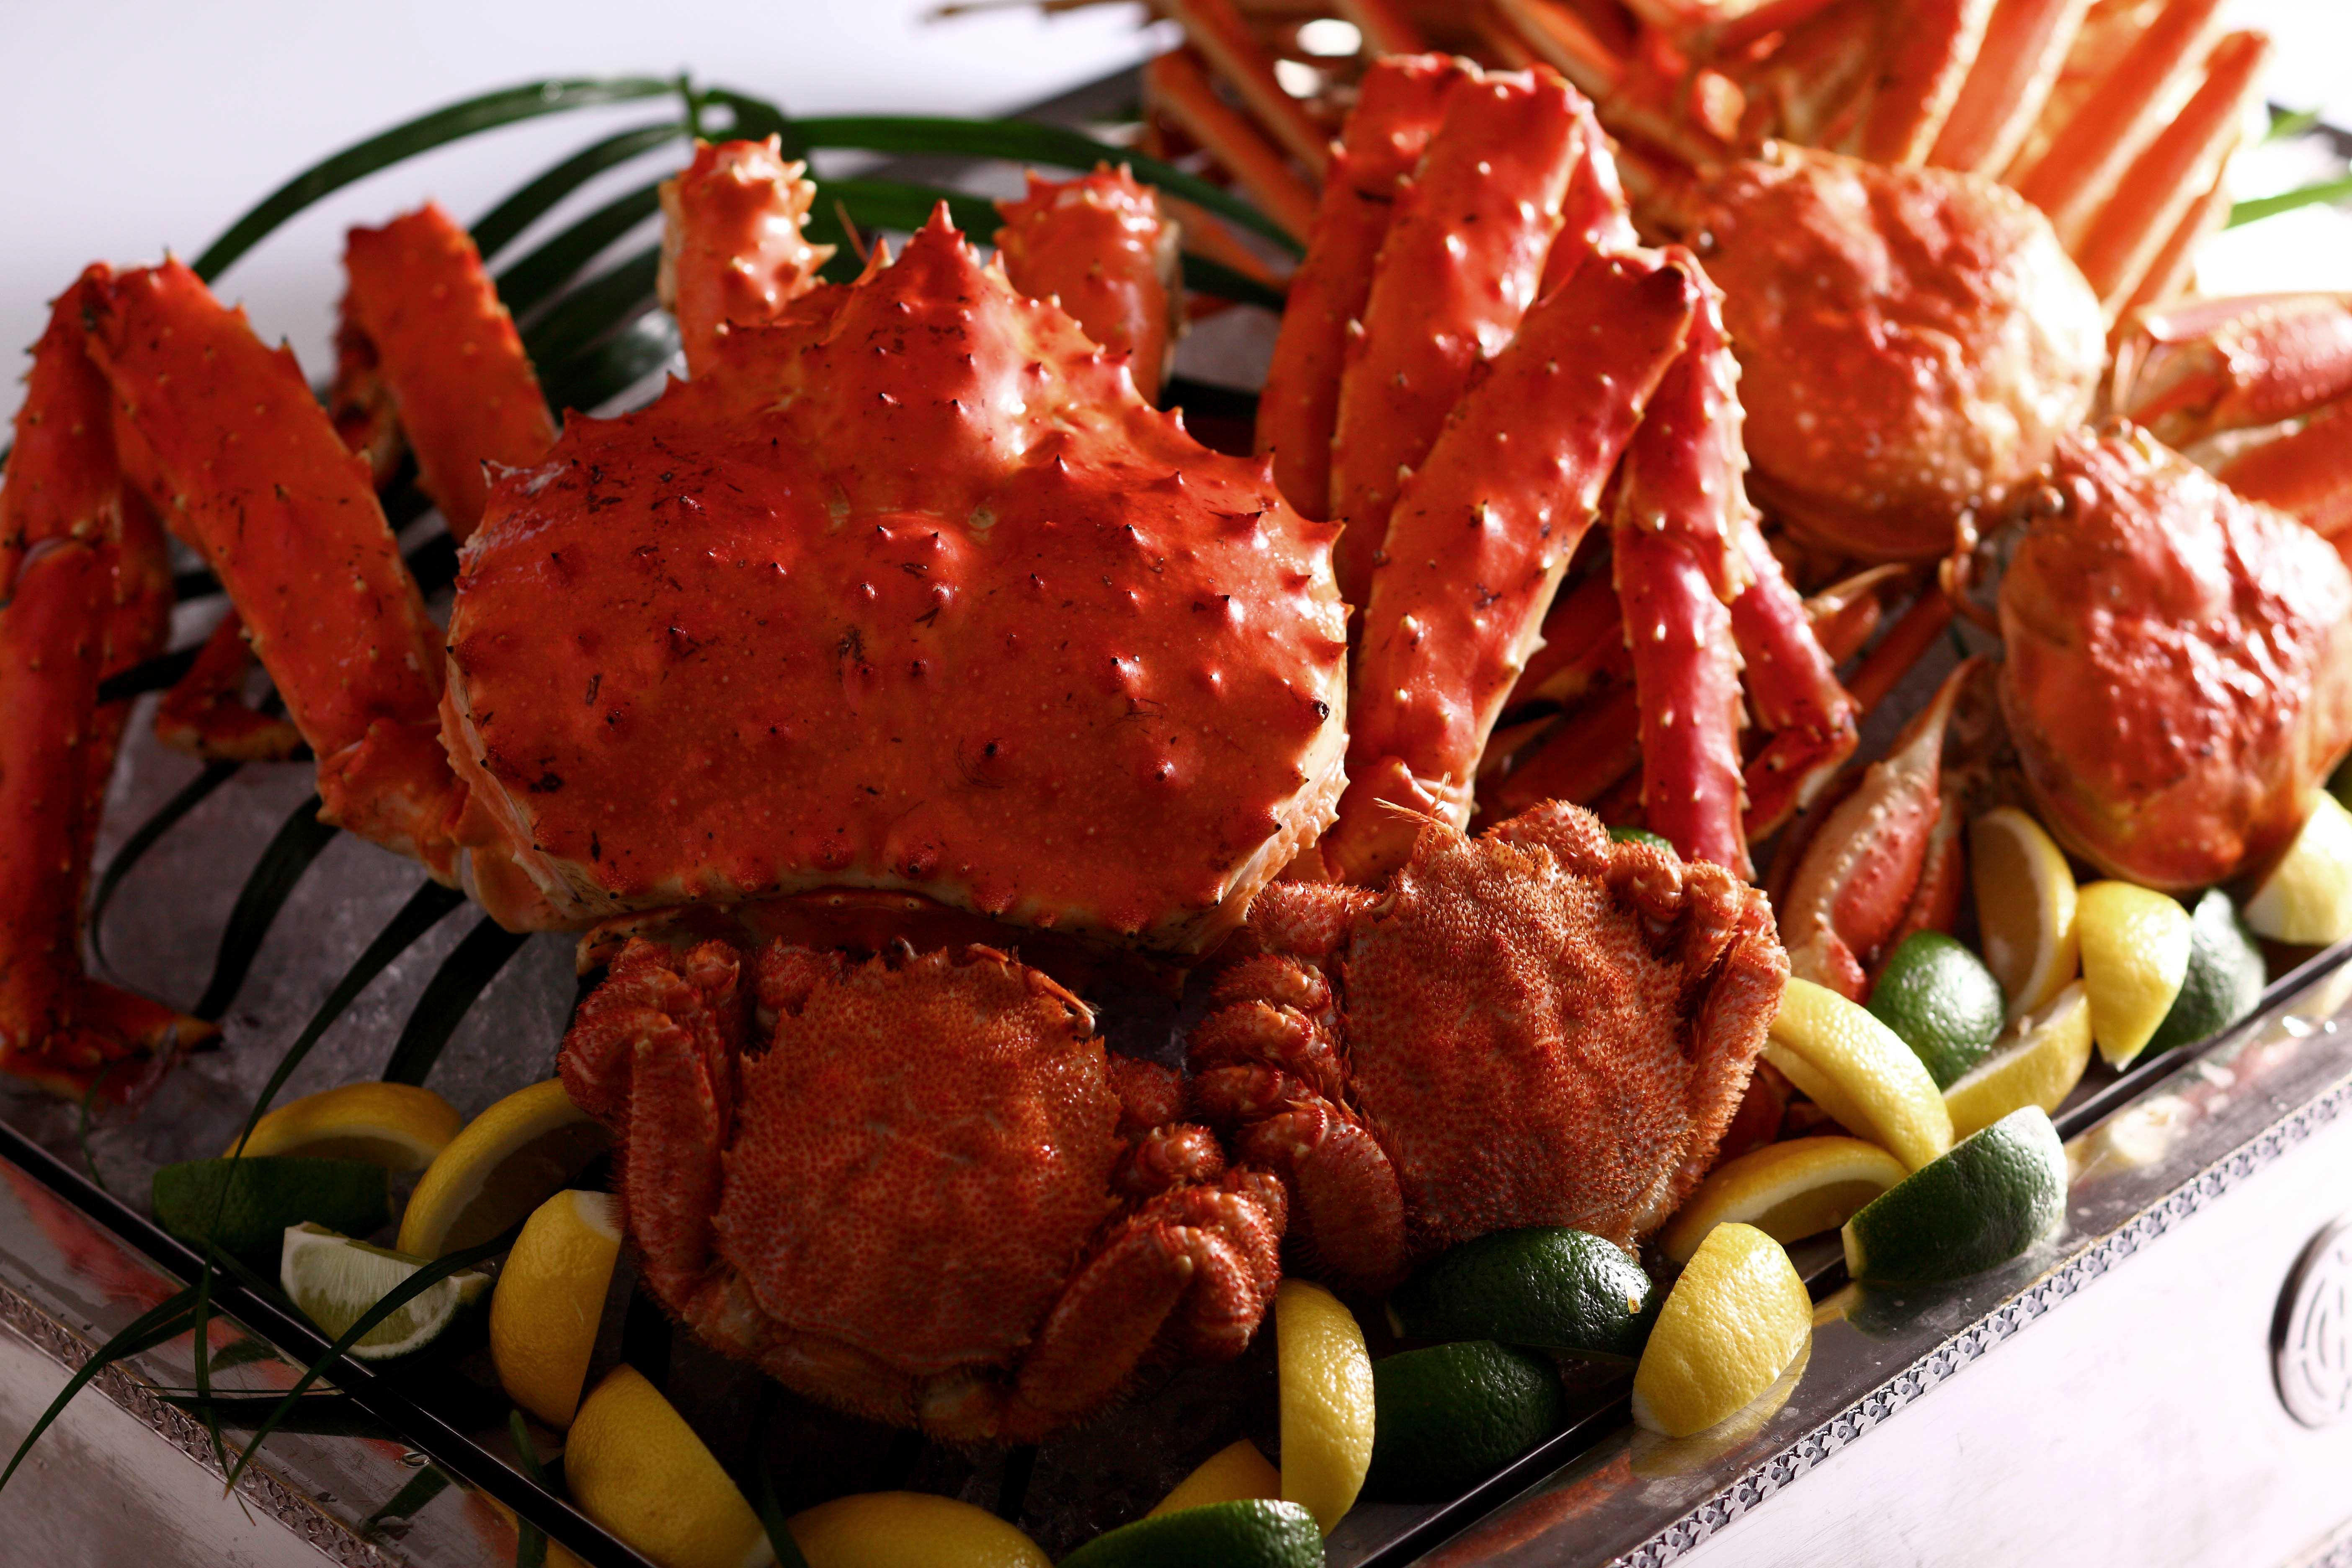 Sheraton Saigon - ẩm thực Tết sepecial menu - elle vietnam 5